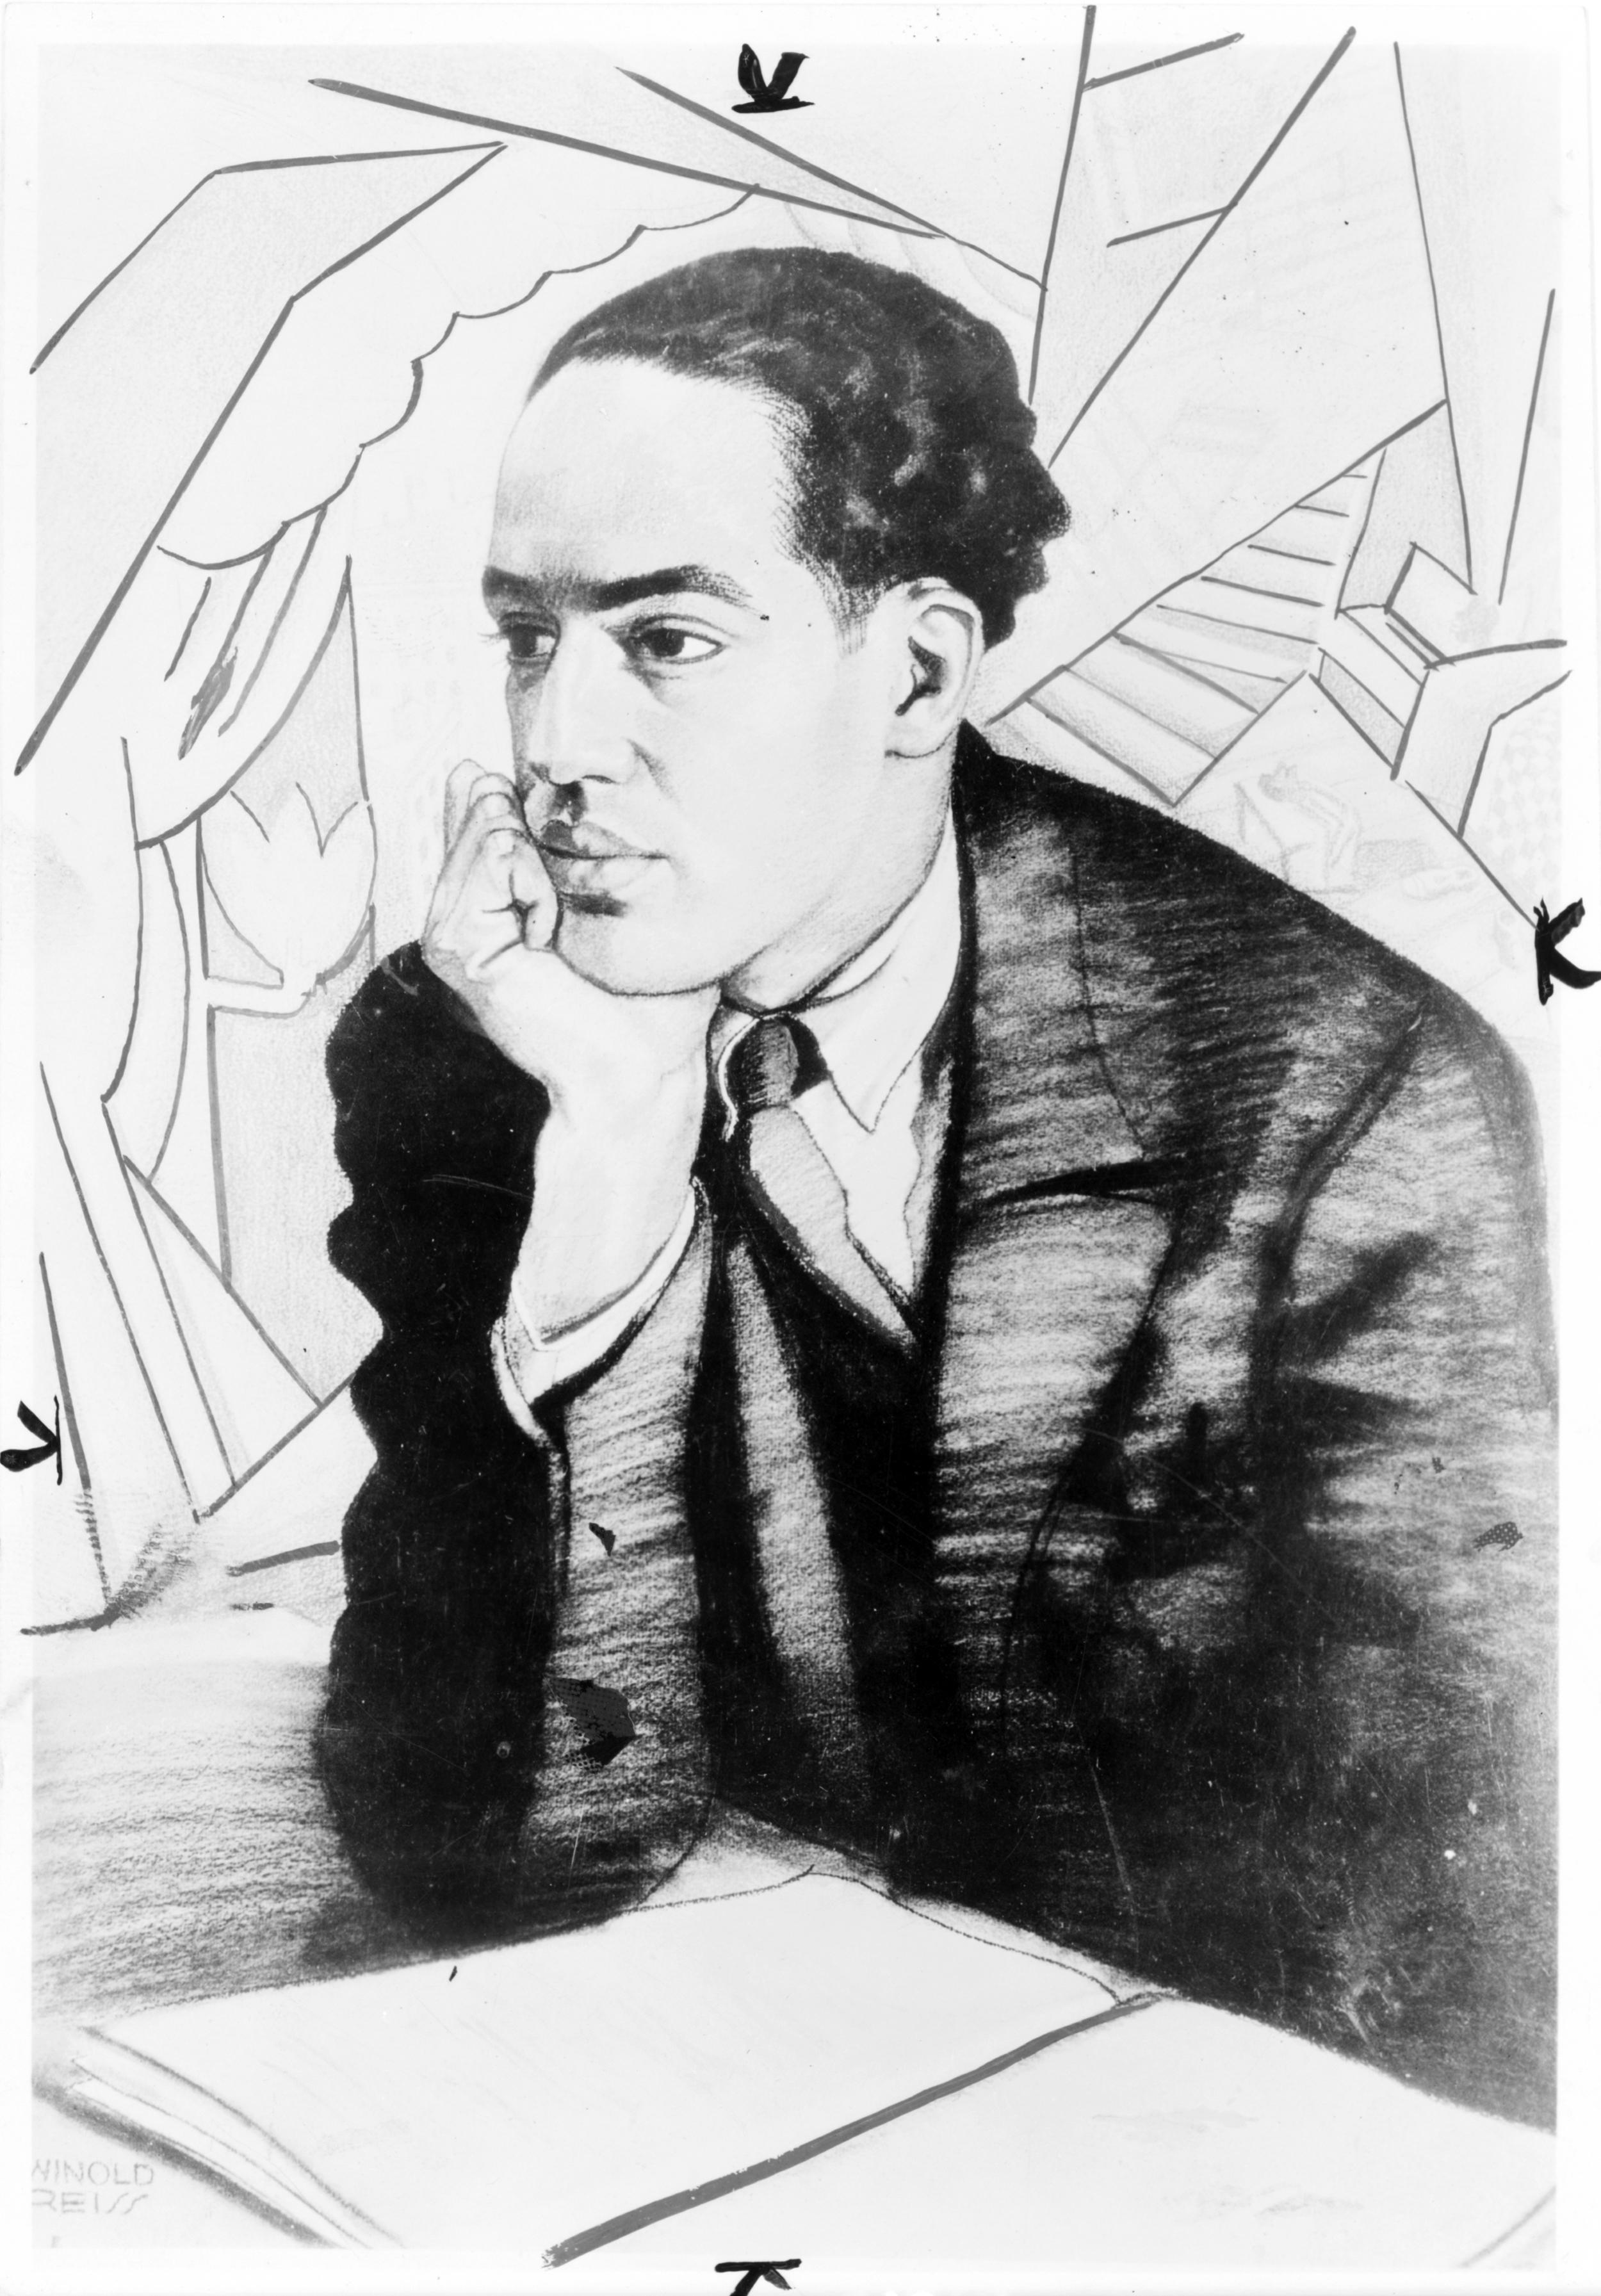 Langston Hughes by Winold Reiss, 1927